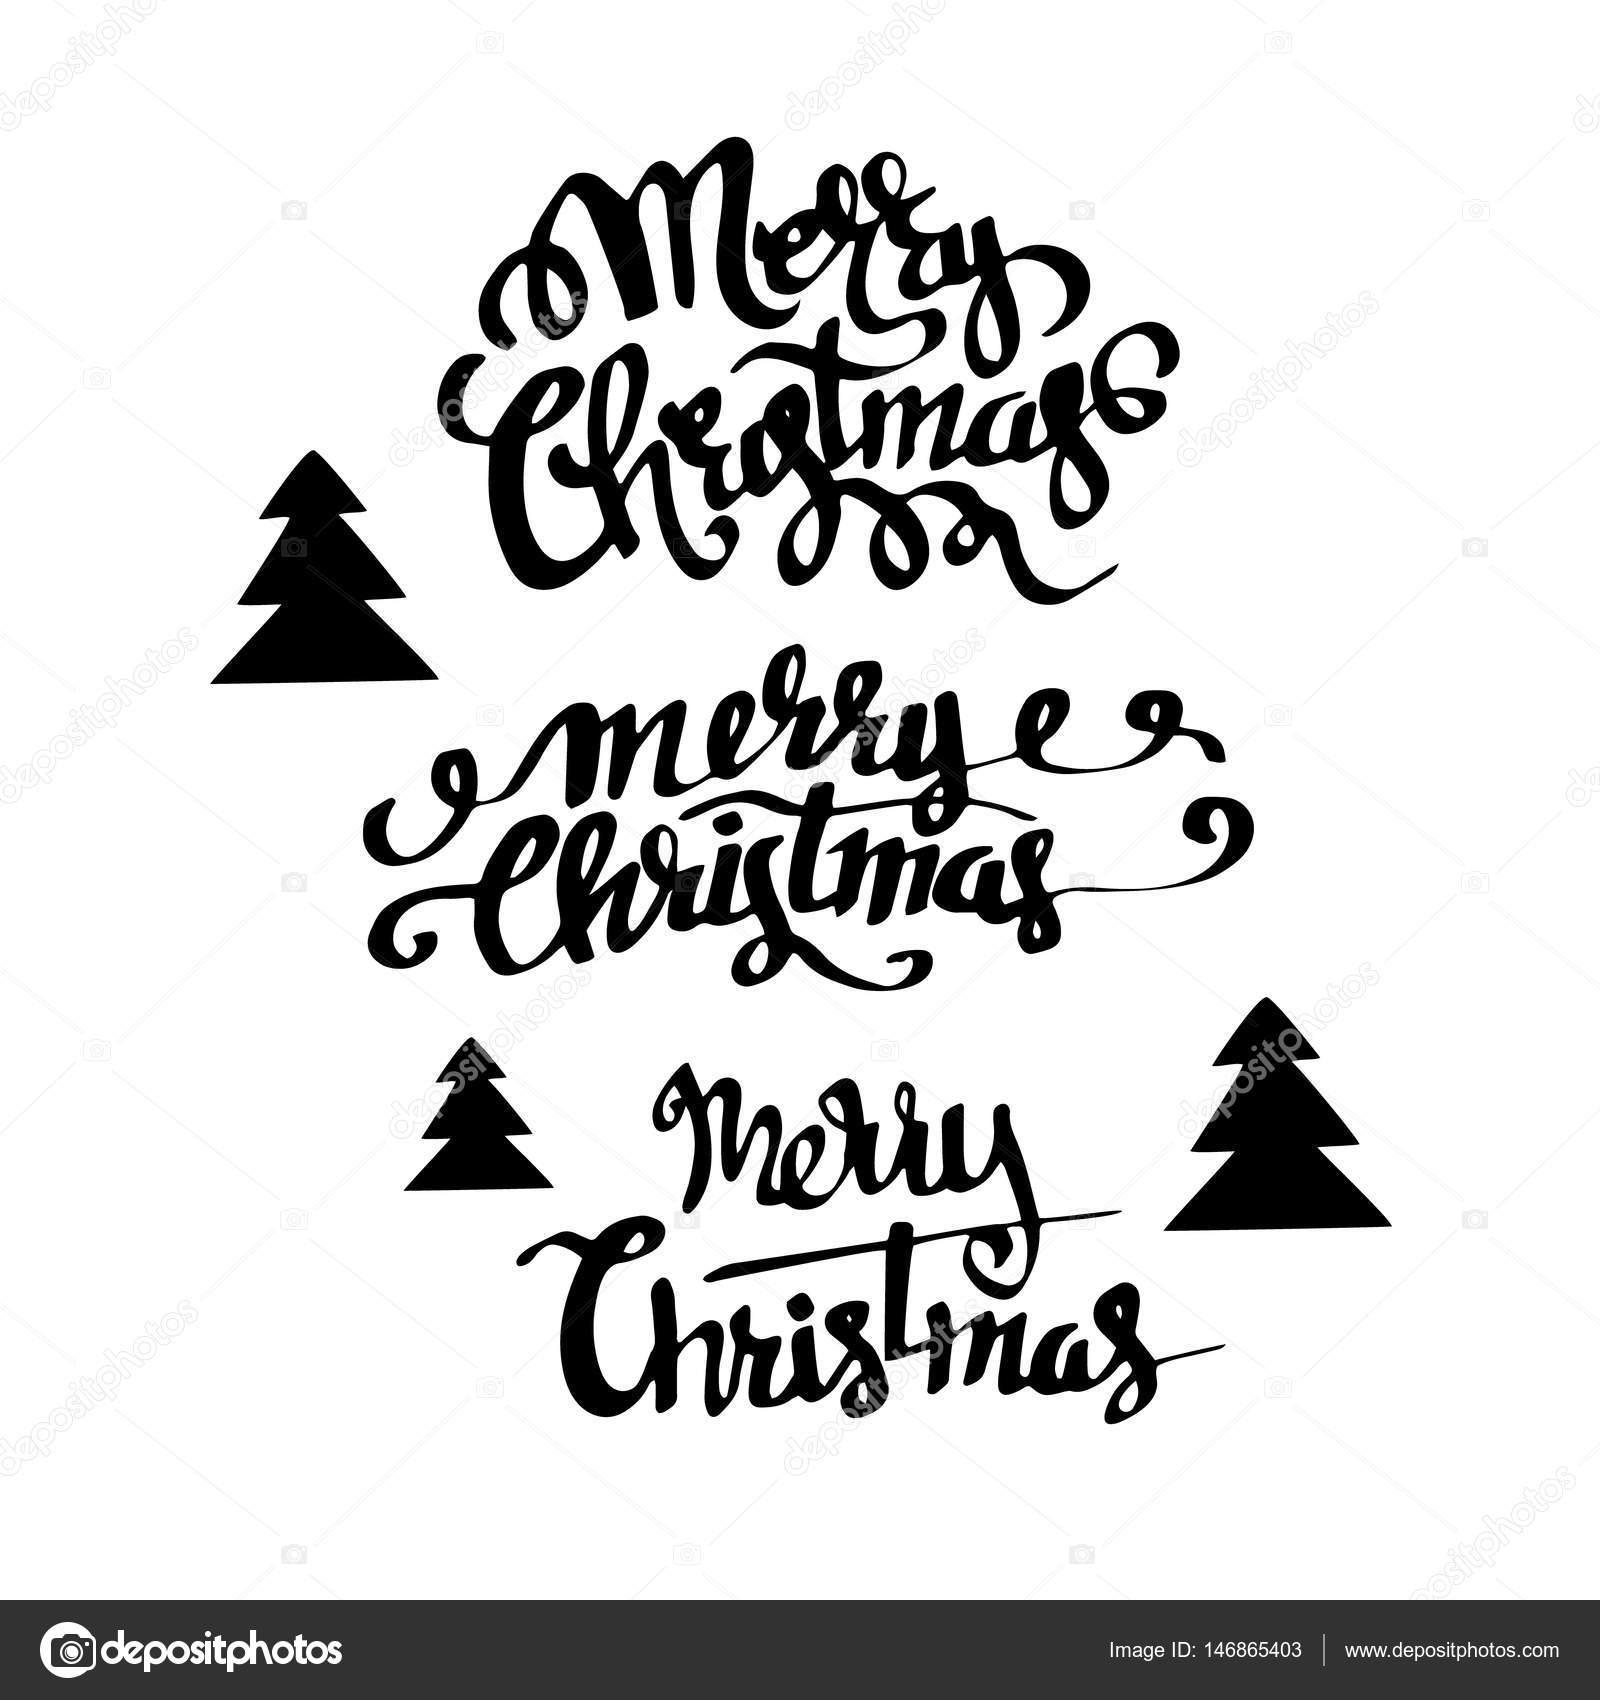 Christmas Banners Merry Christmas Handwritten Calligraphy